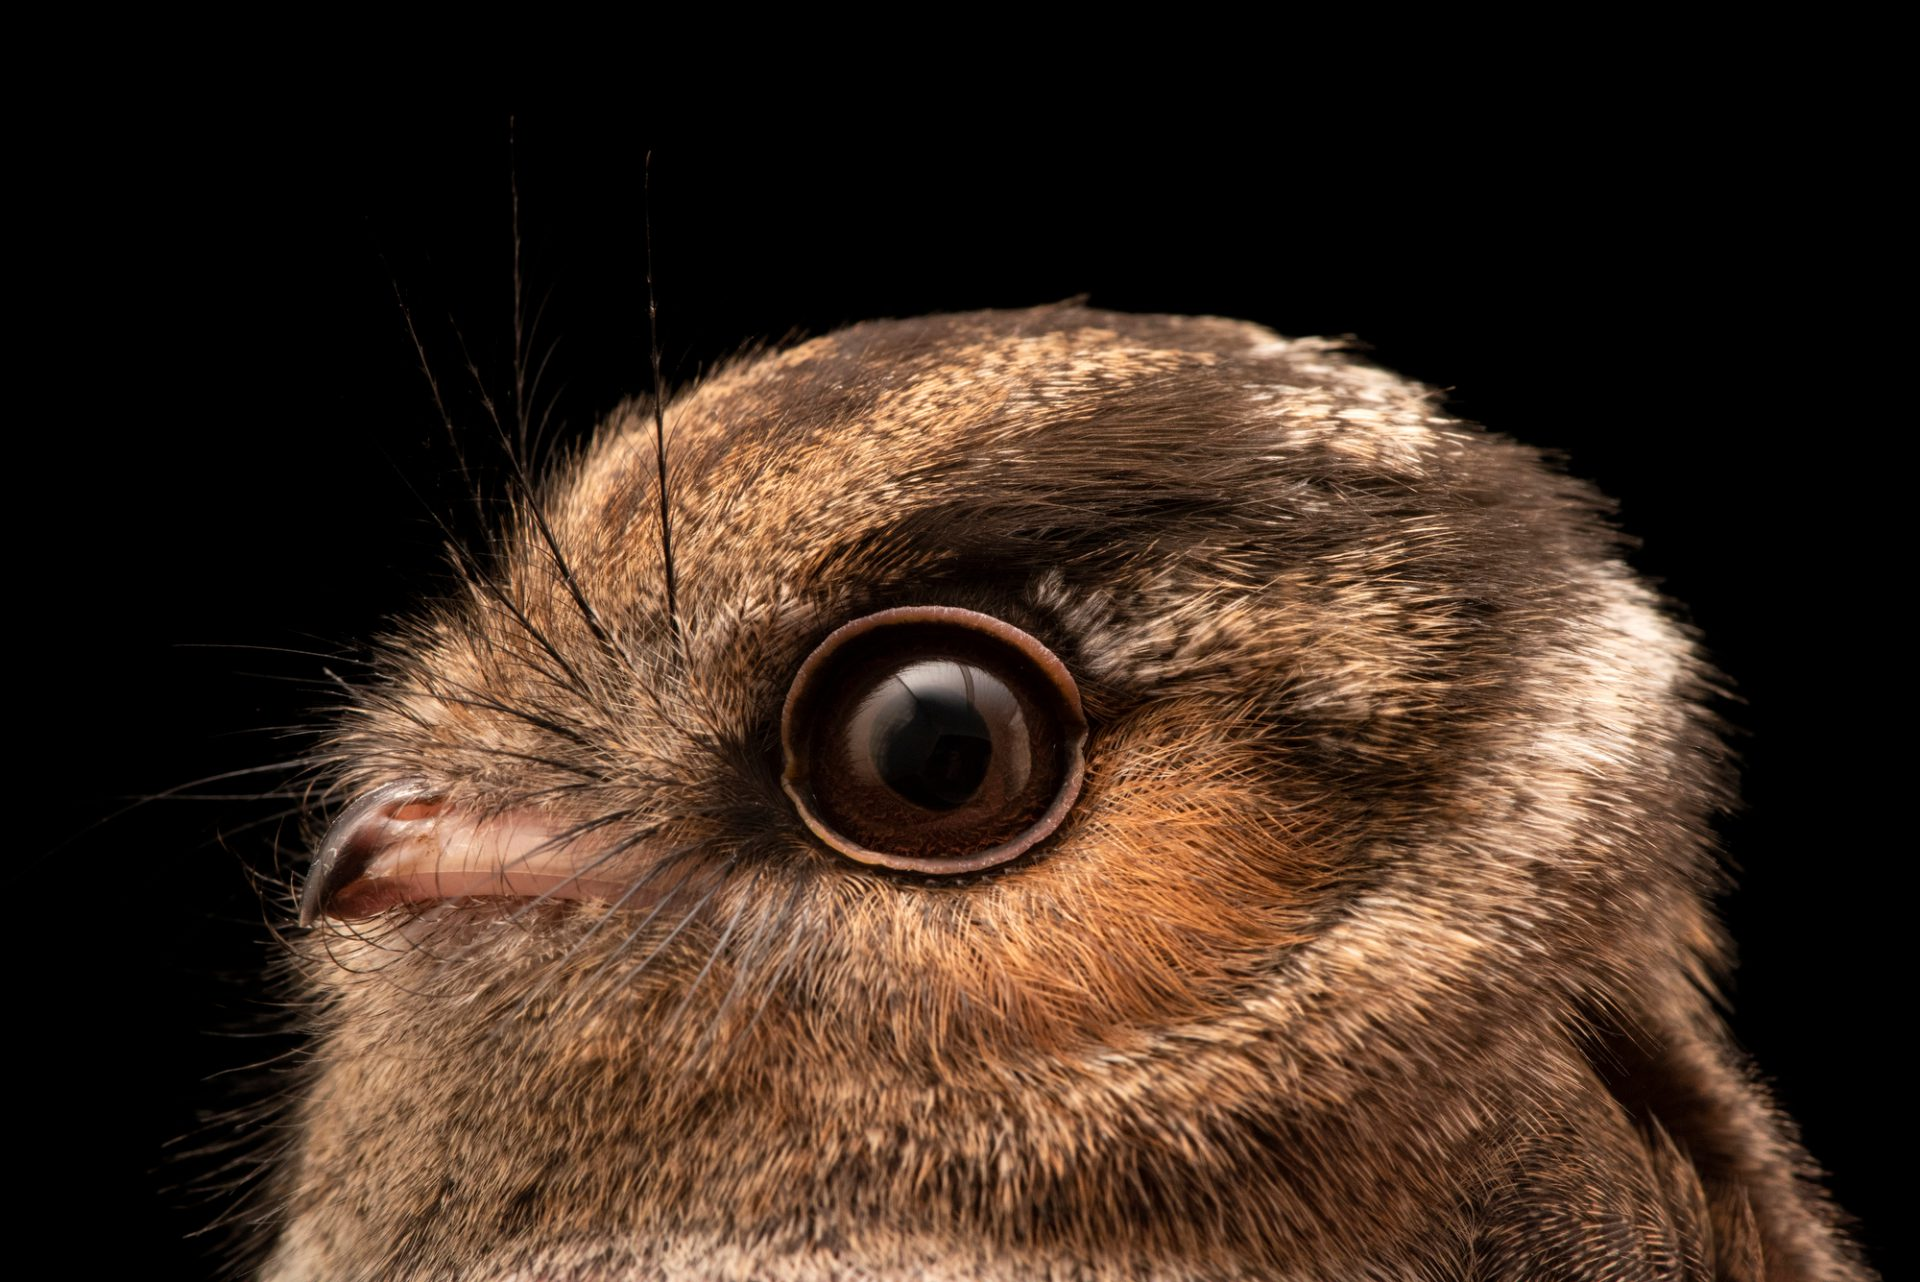 Photo: Australian owlet nightjar (Aegotheles cristatus) at Moonlit Sanctuary